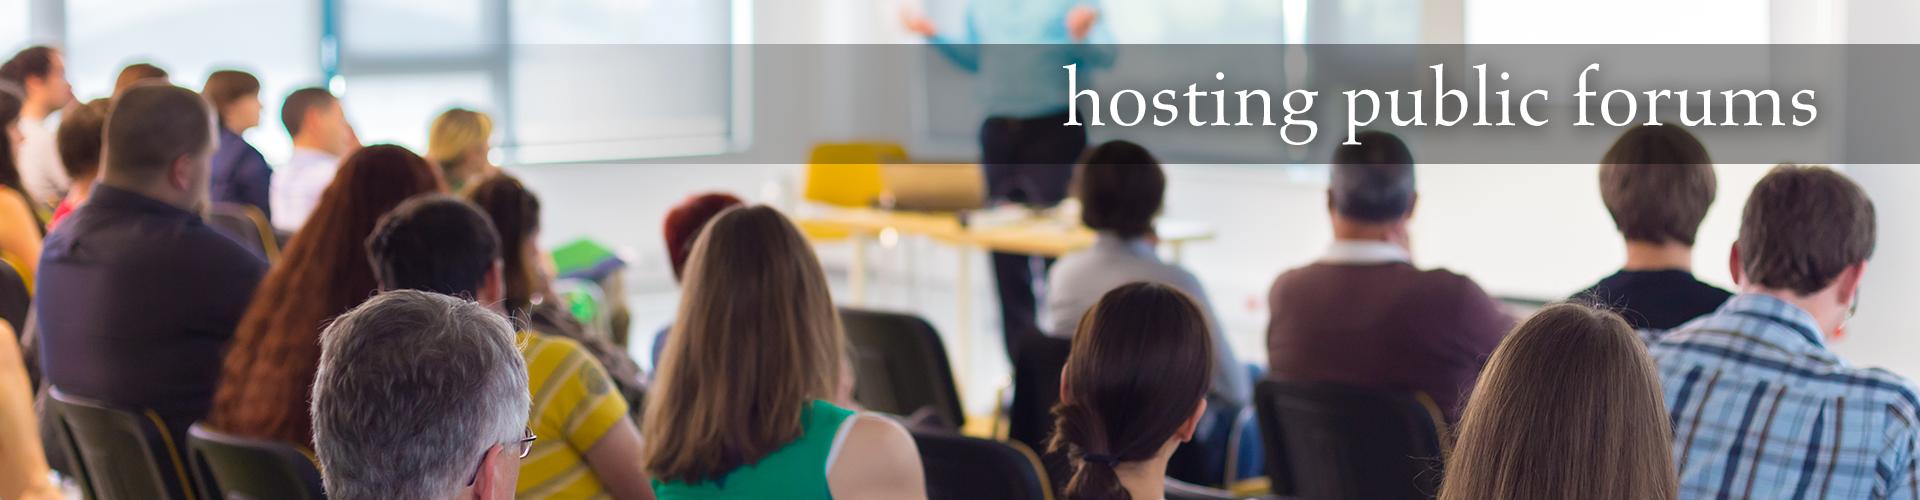 hosting public forums